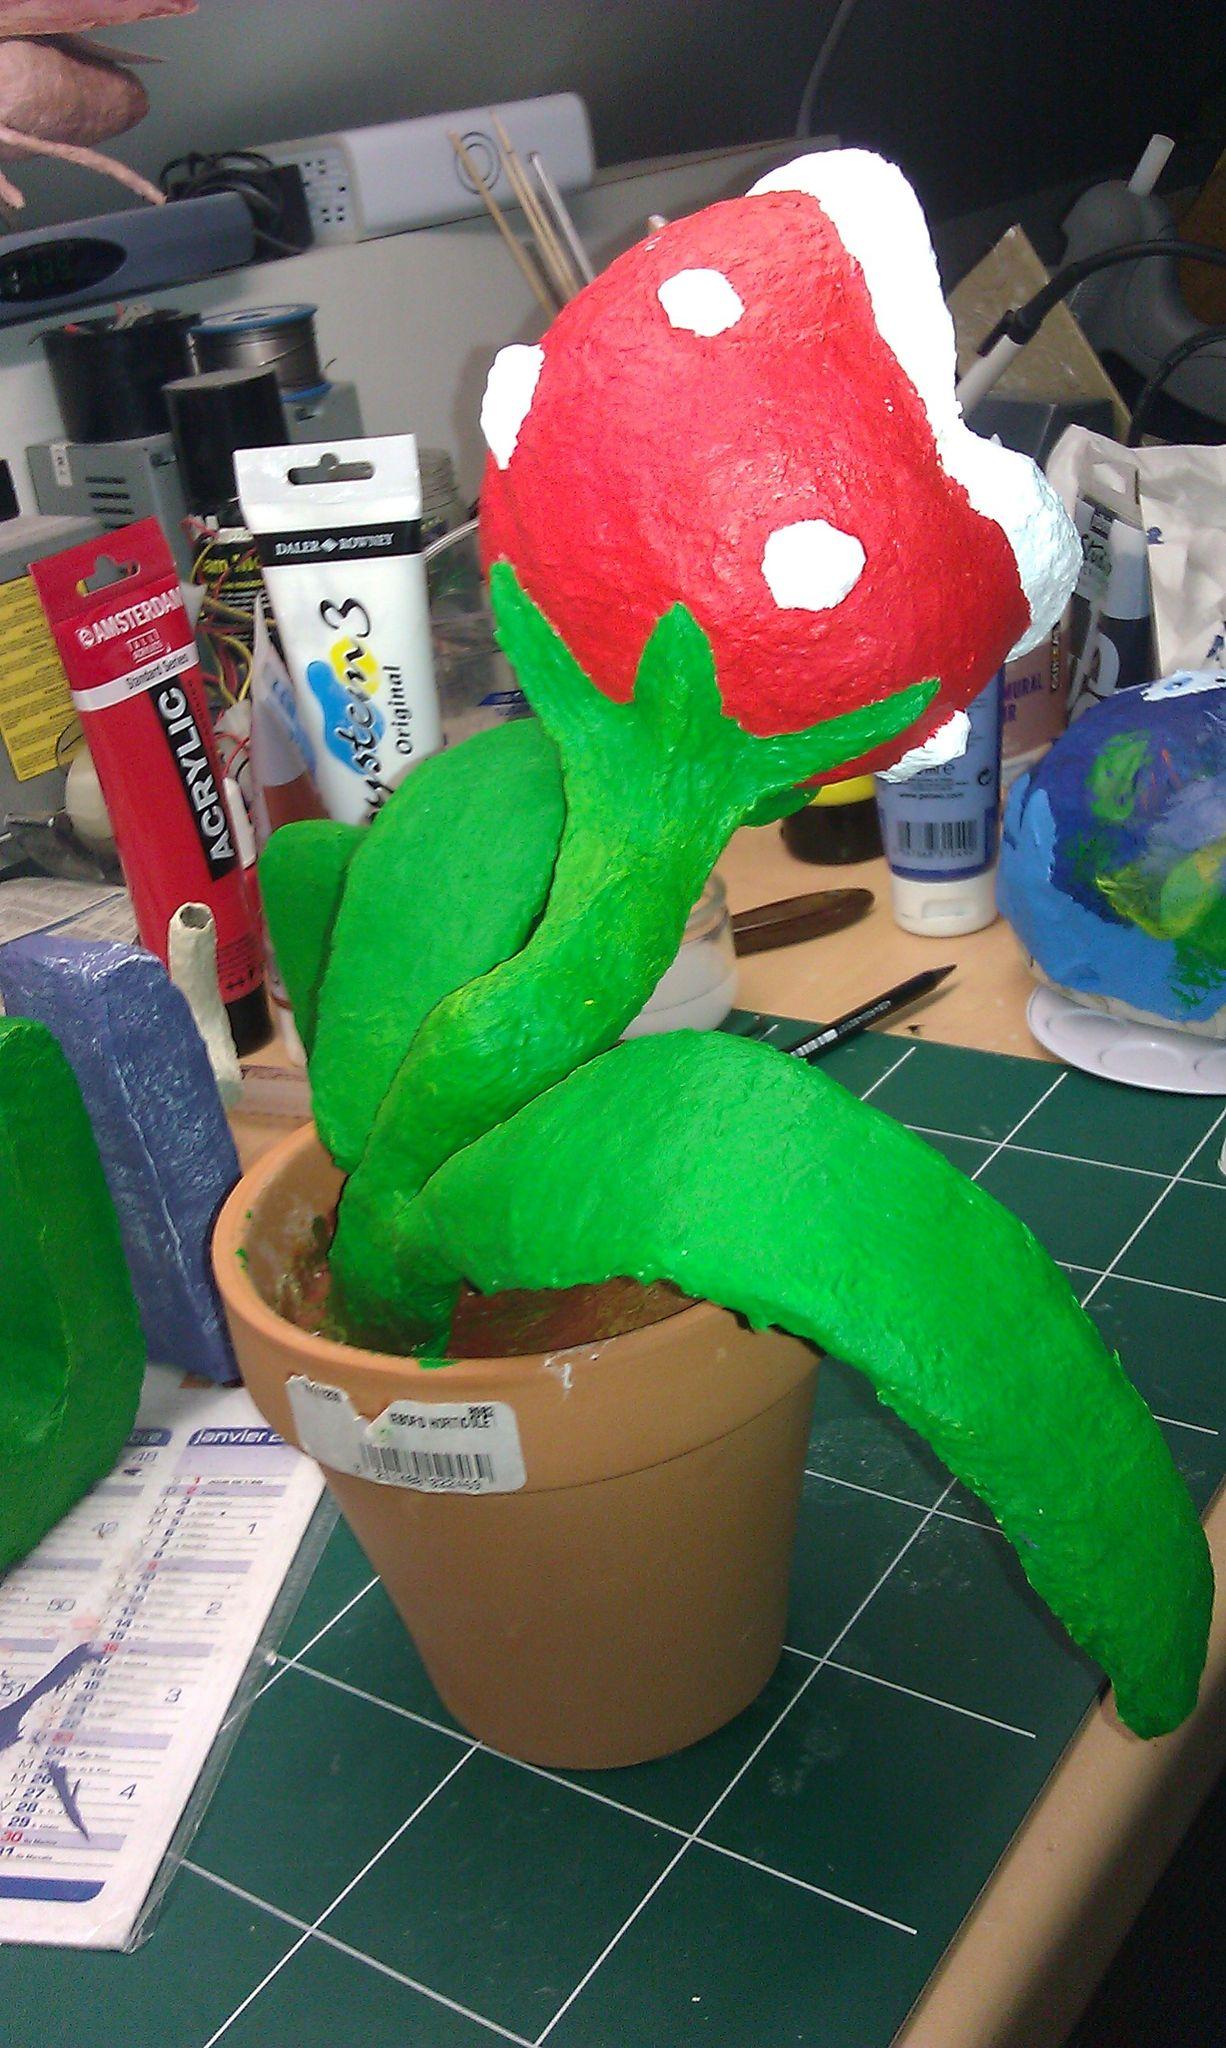 Plante carnivore mario plante piranha or audrey dans le film little shop of horrors 2 les - Plante carnivore mario ...